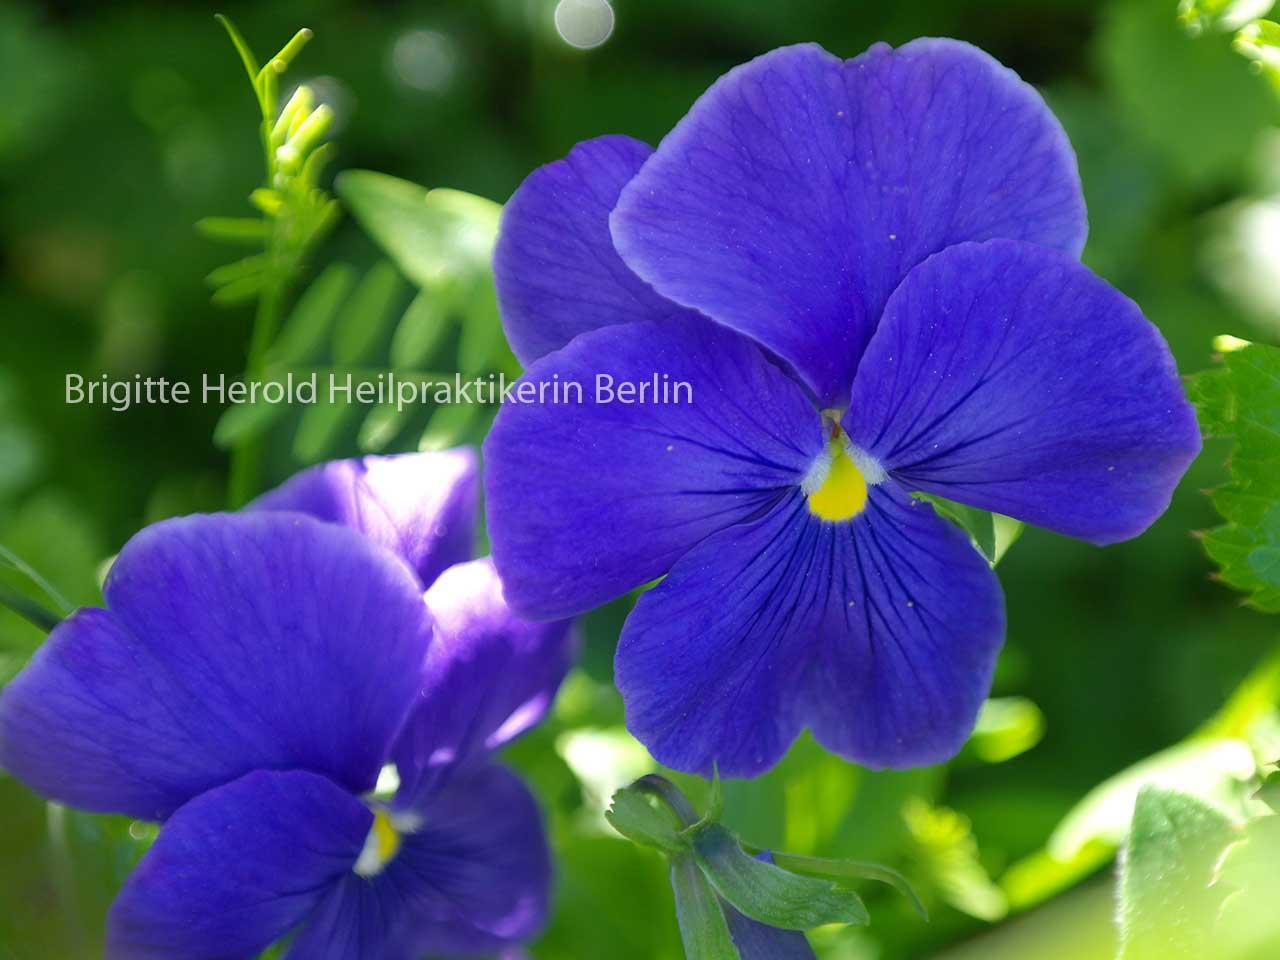 Bachblüten Berlin - Brigitte Herold